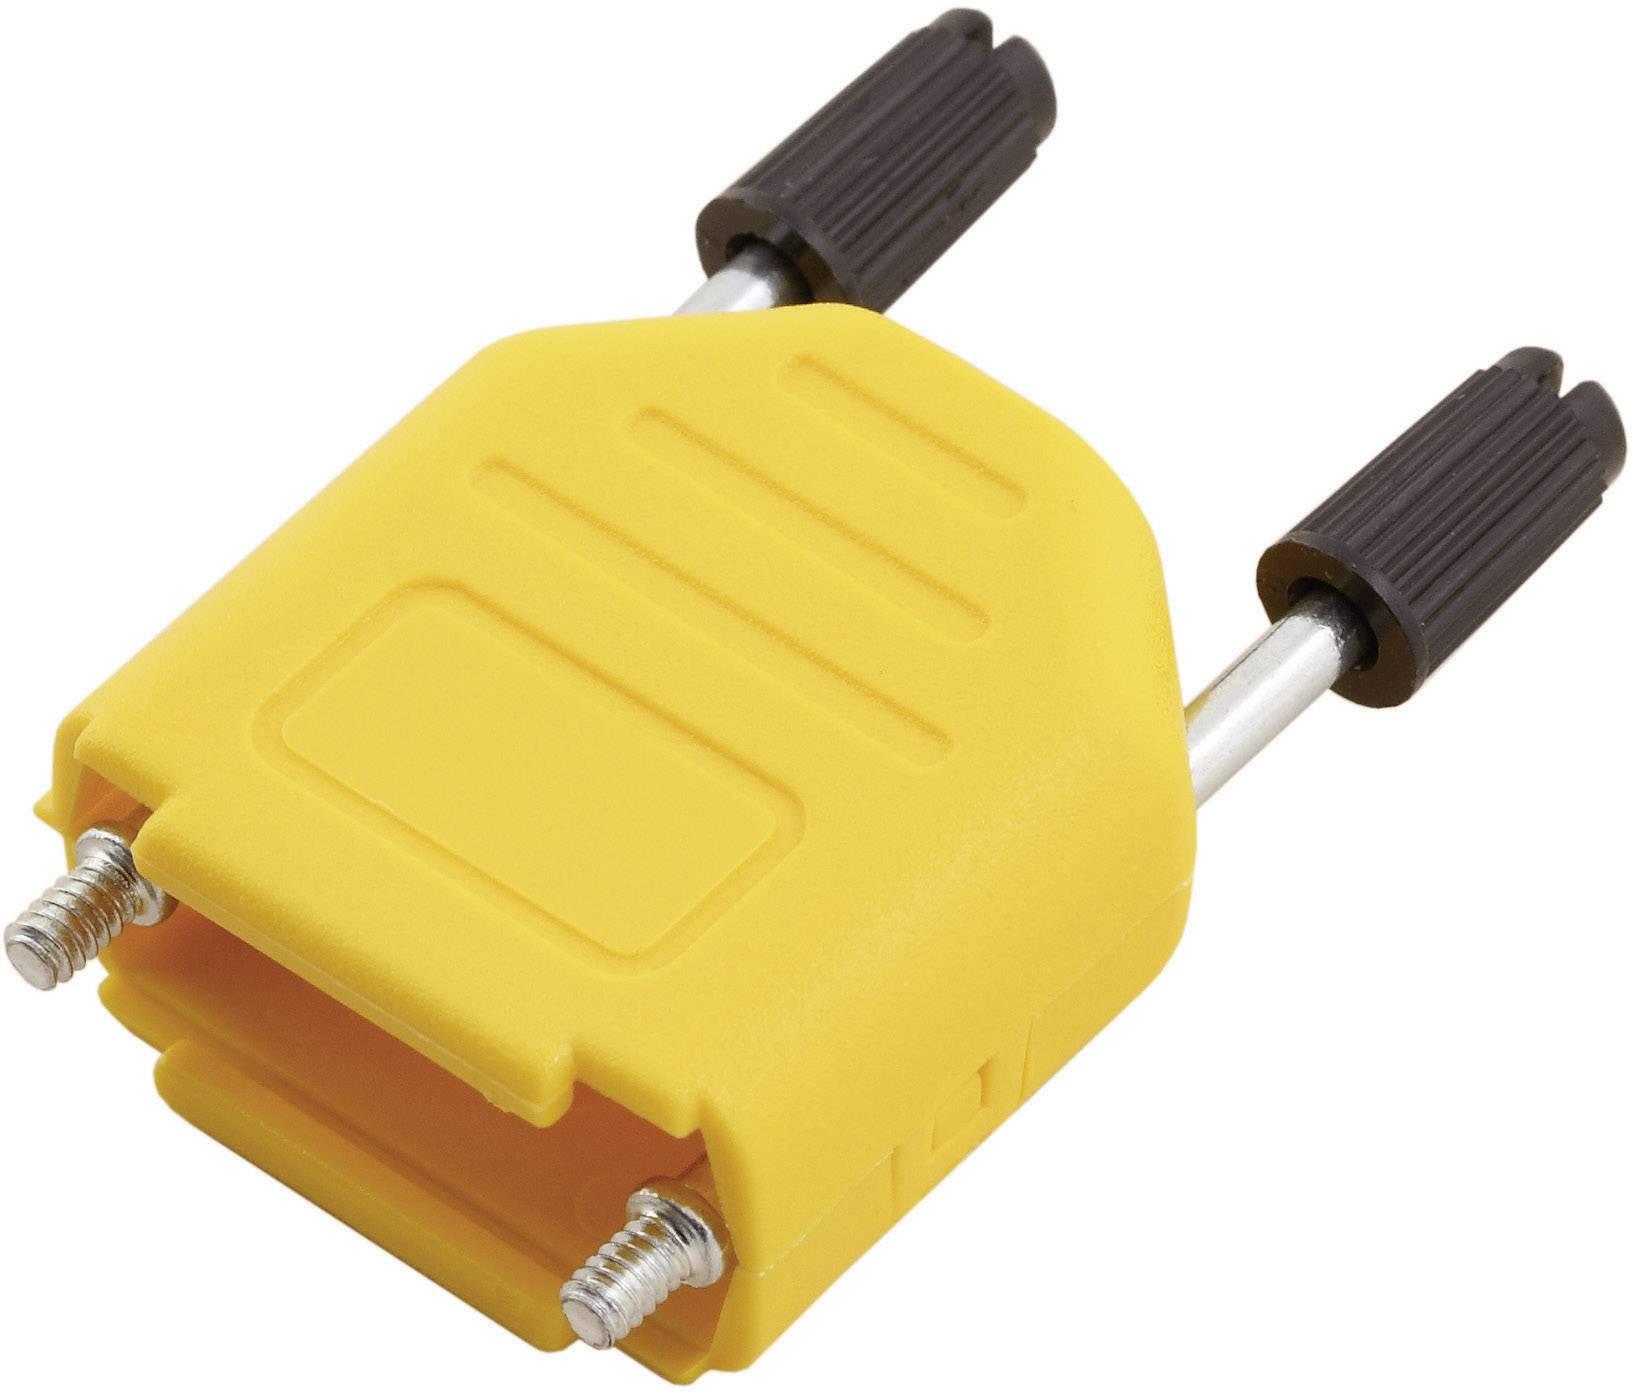 D-SUB púzdro MH Connectors MHDPPK15-Y-K 6353-0105-02, Počet pinov: 15, plast, 180 °, žltá, 1 ks